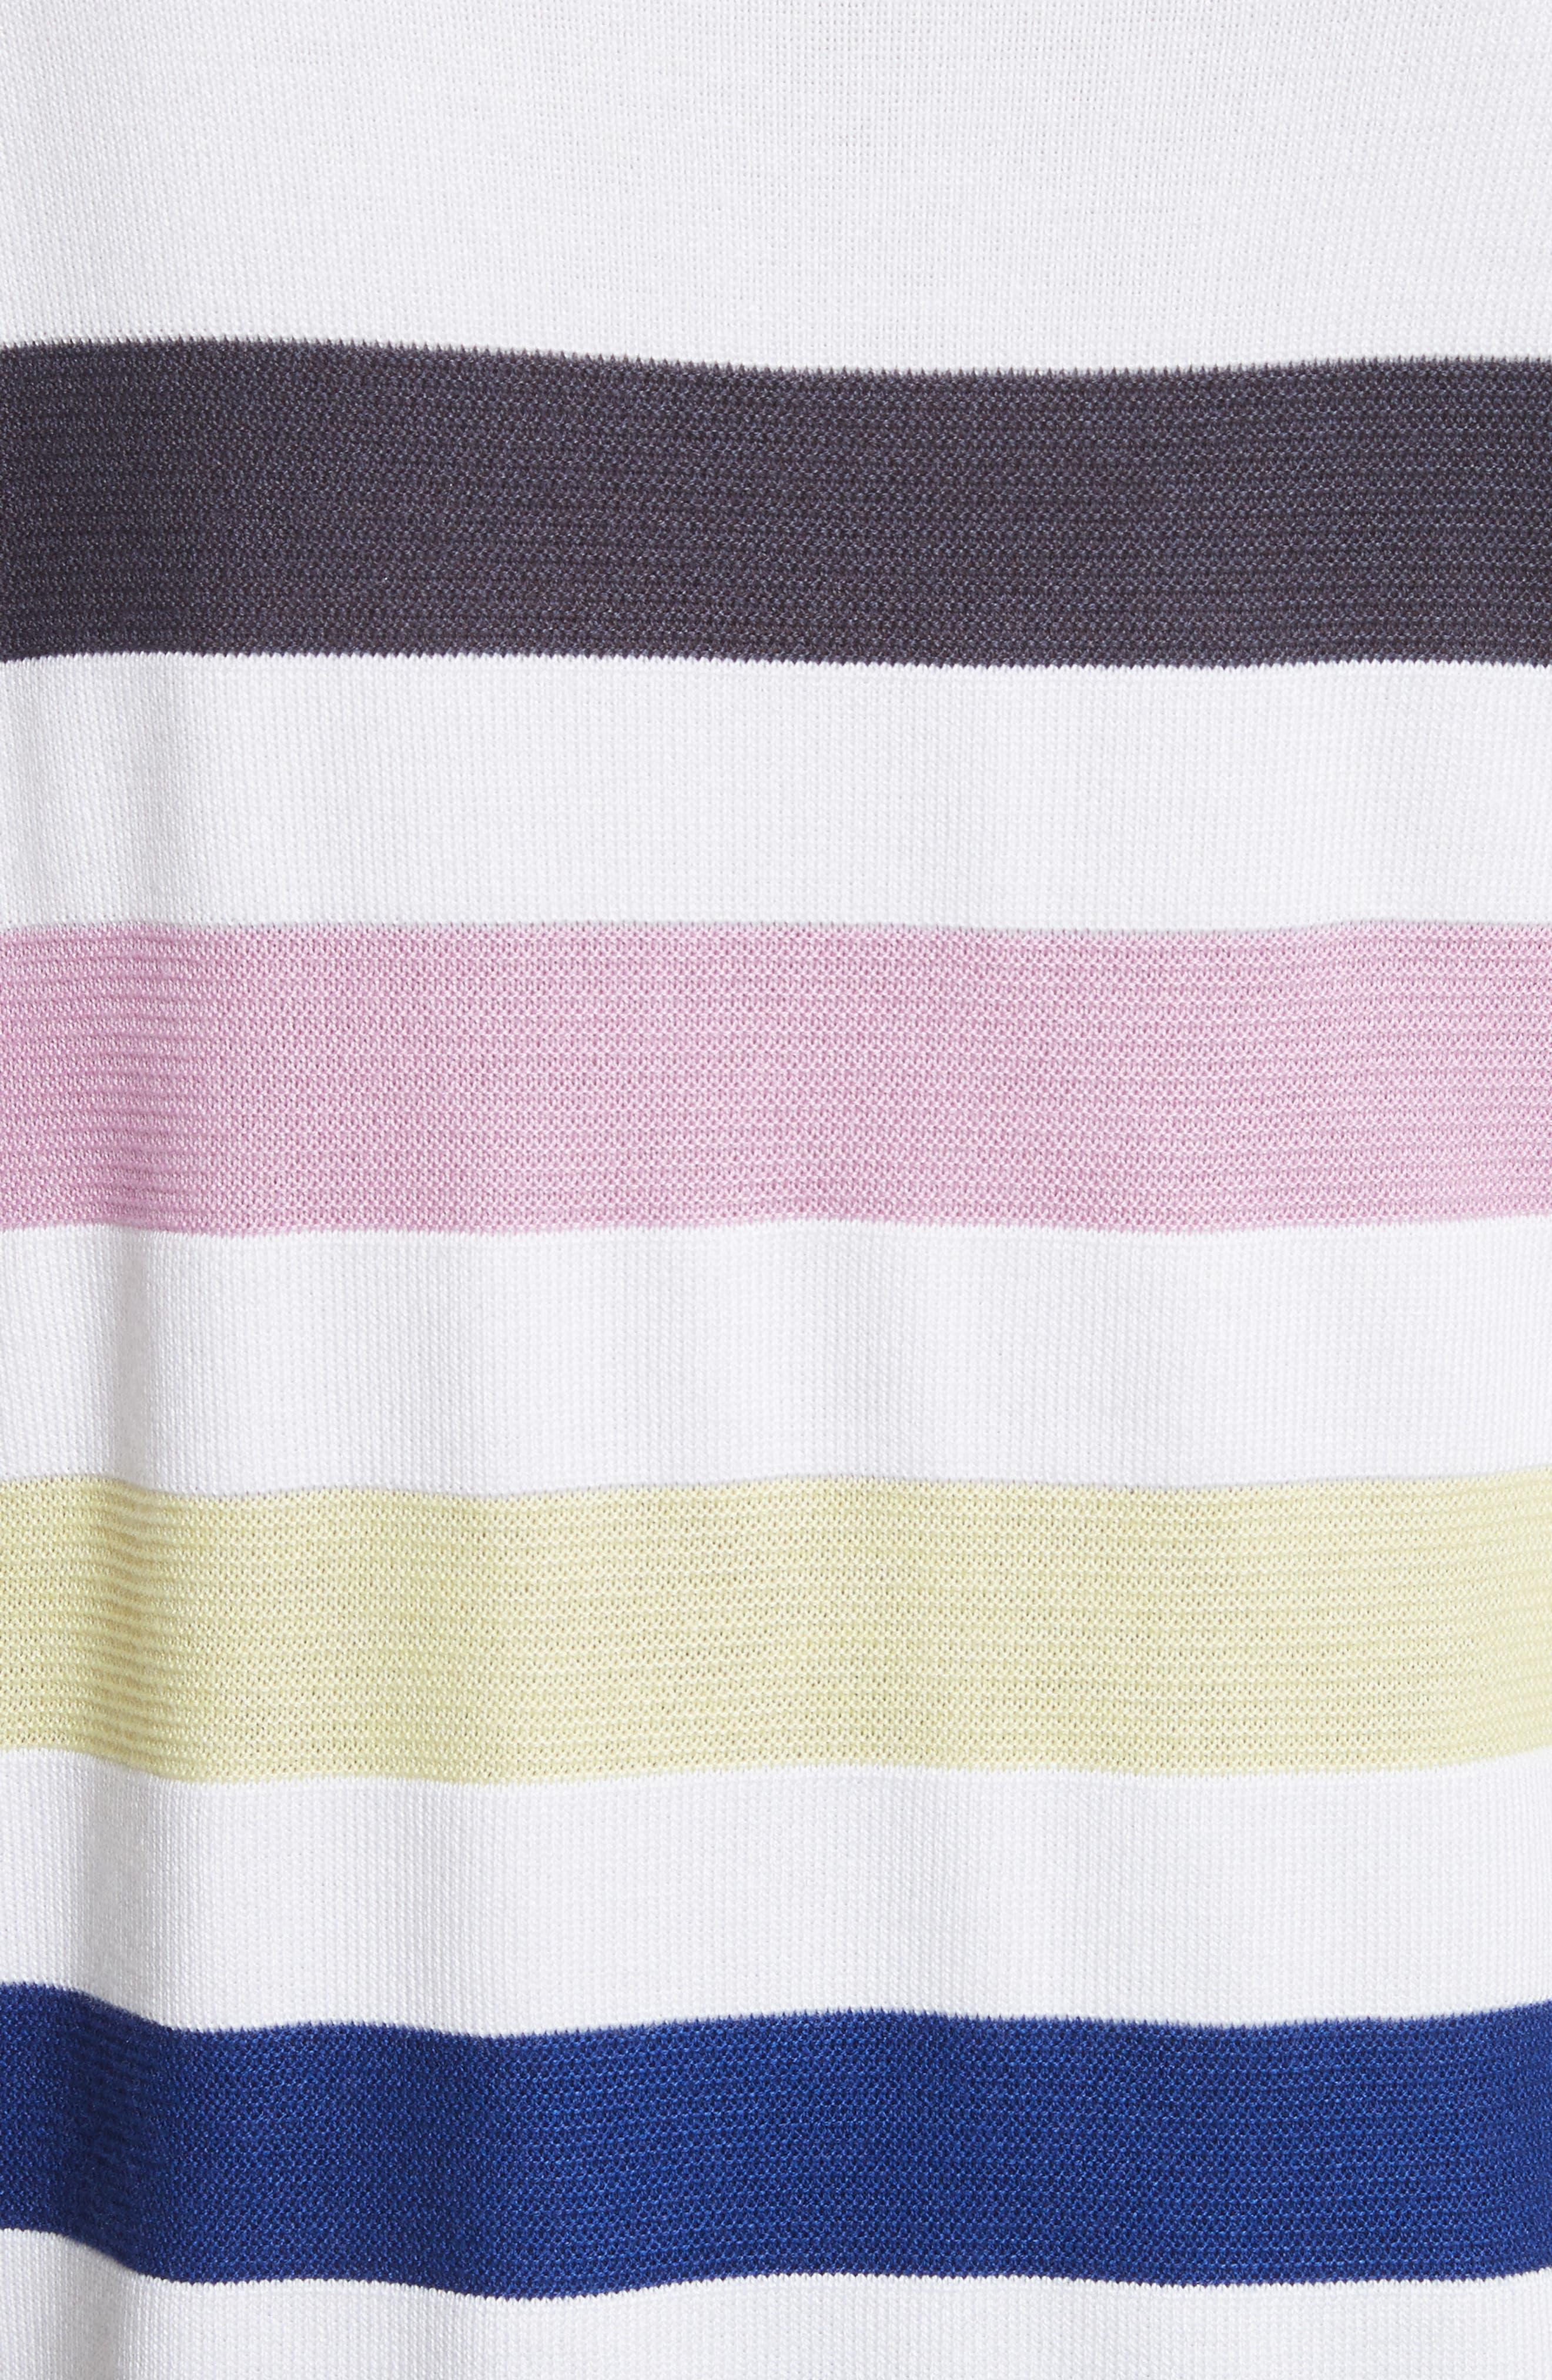 Links Stripe Knit Sweater,                             Alternate thumbnail 5, color,                             100